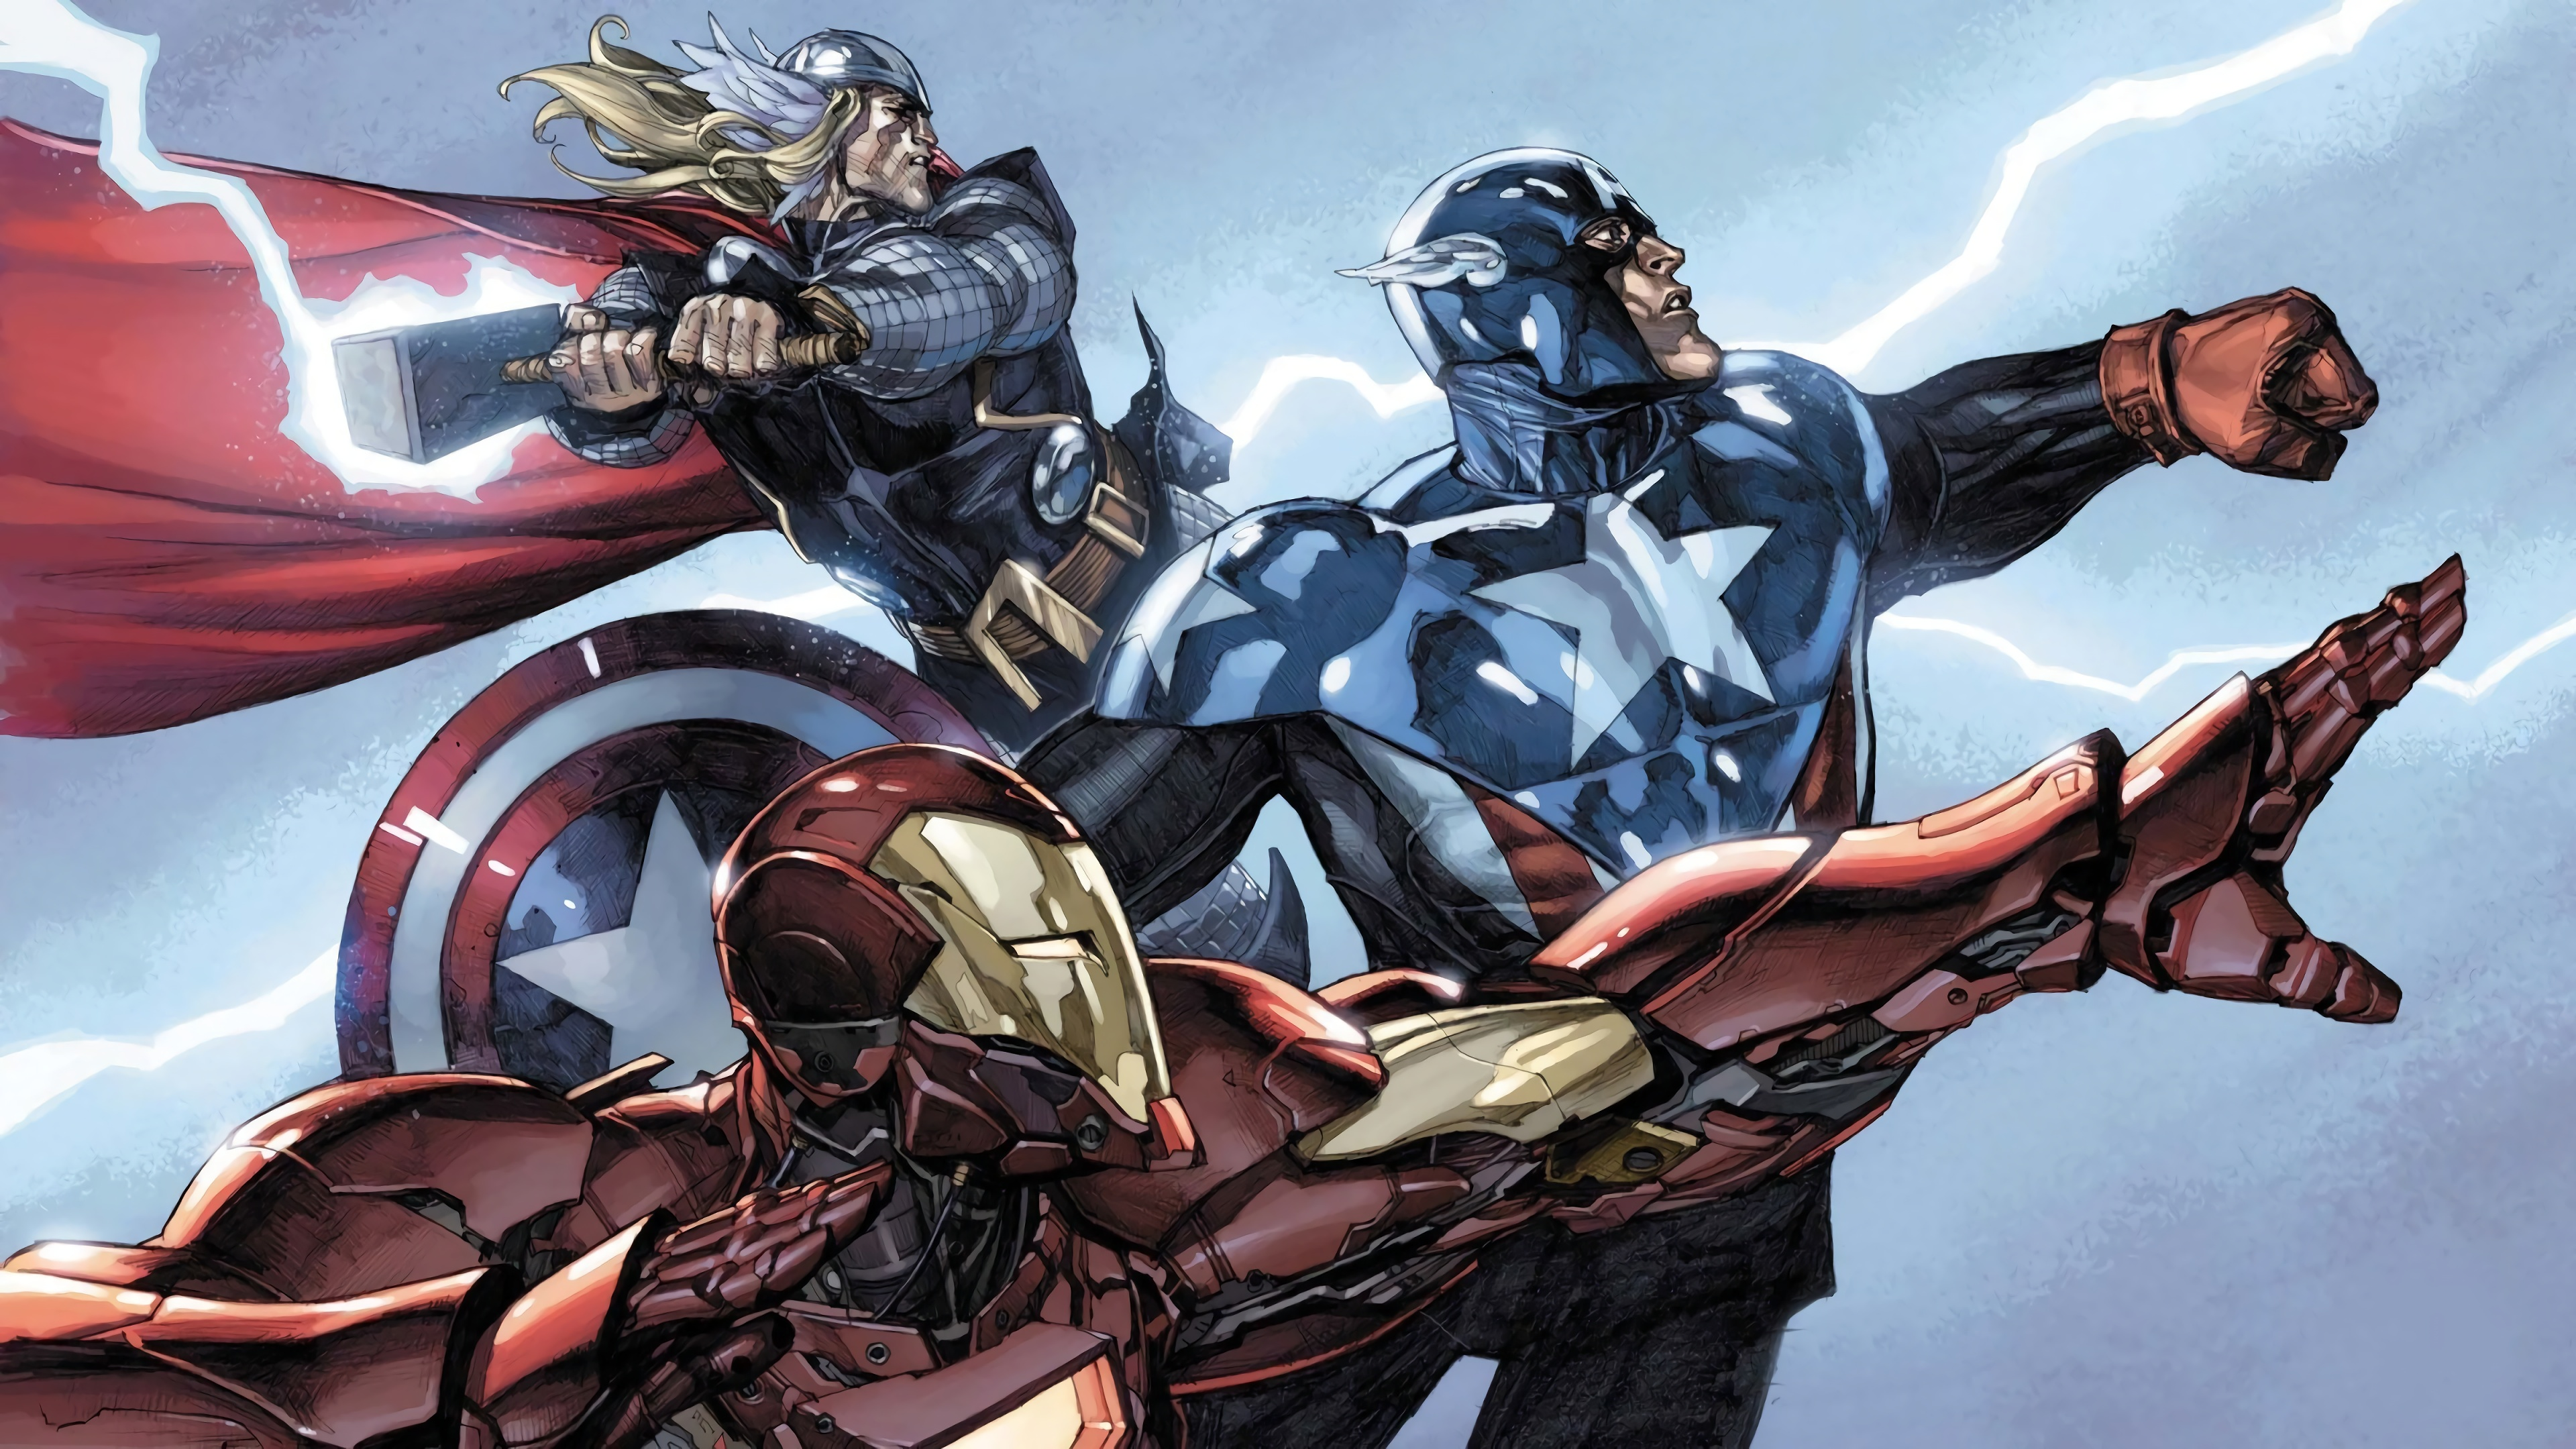 iron man captain america thor marvel comics 4k wallpaper 1544829426 - Iron Man Captain America Thor Marvel Comics 4K Wallpaper - Thor, Marvel Comics, Iron Man, Comics, captain america